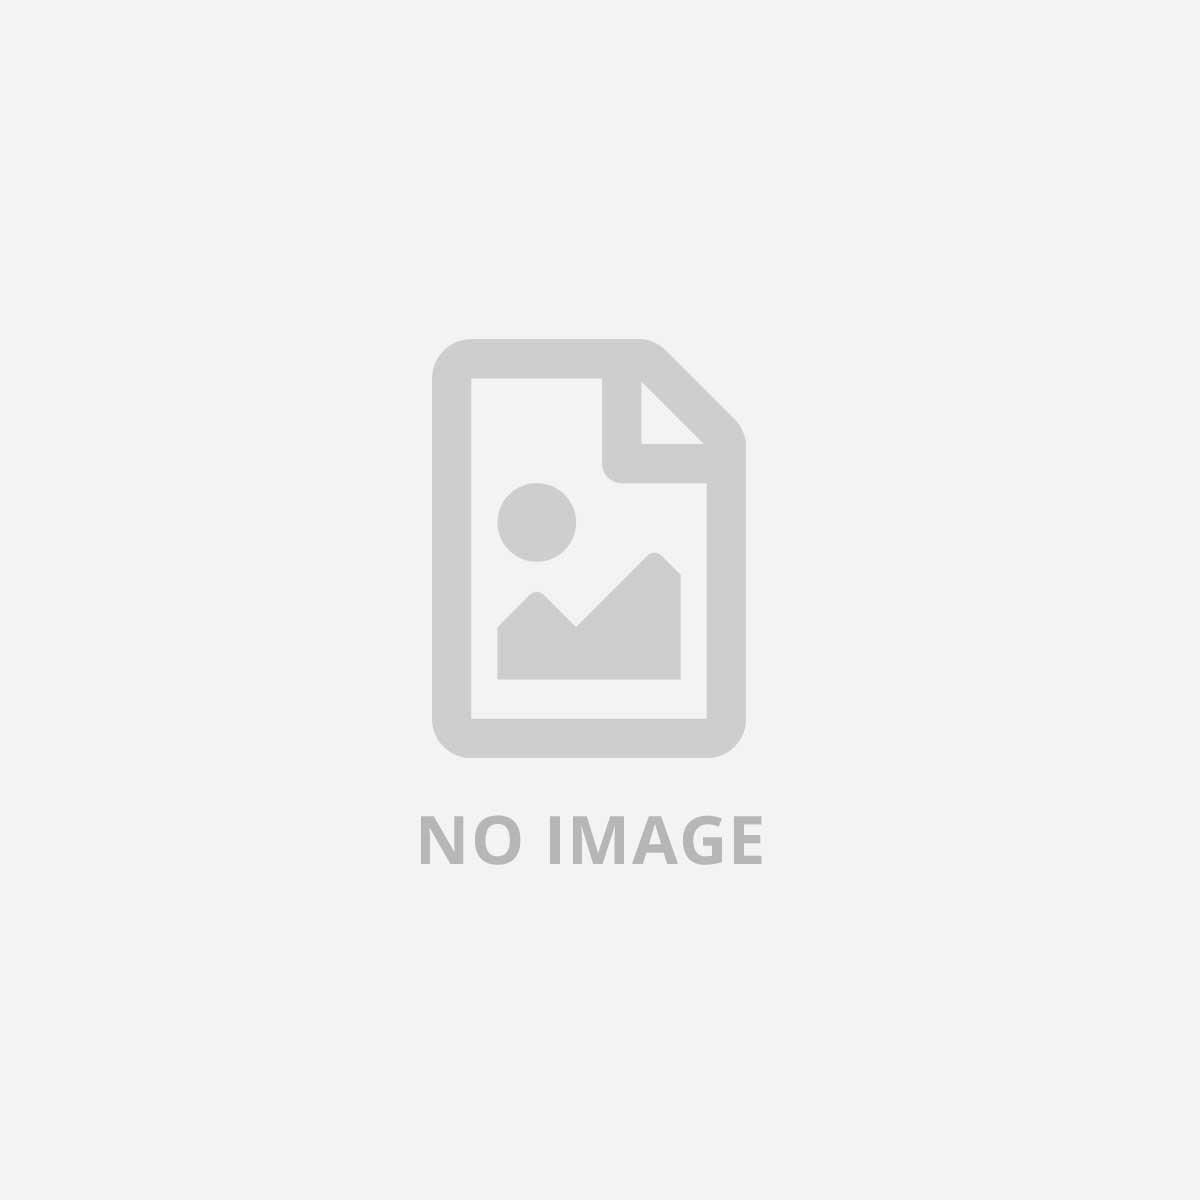 SITECOM HUB USB-C 4 PORT USB-C - 5GBPS